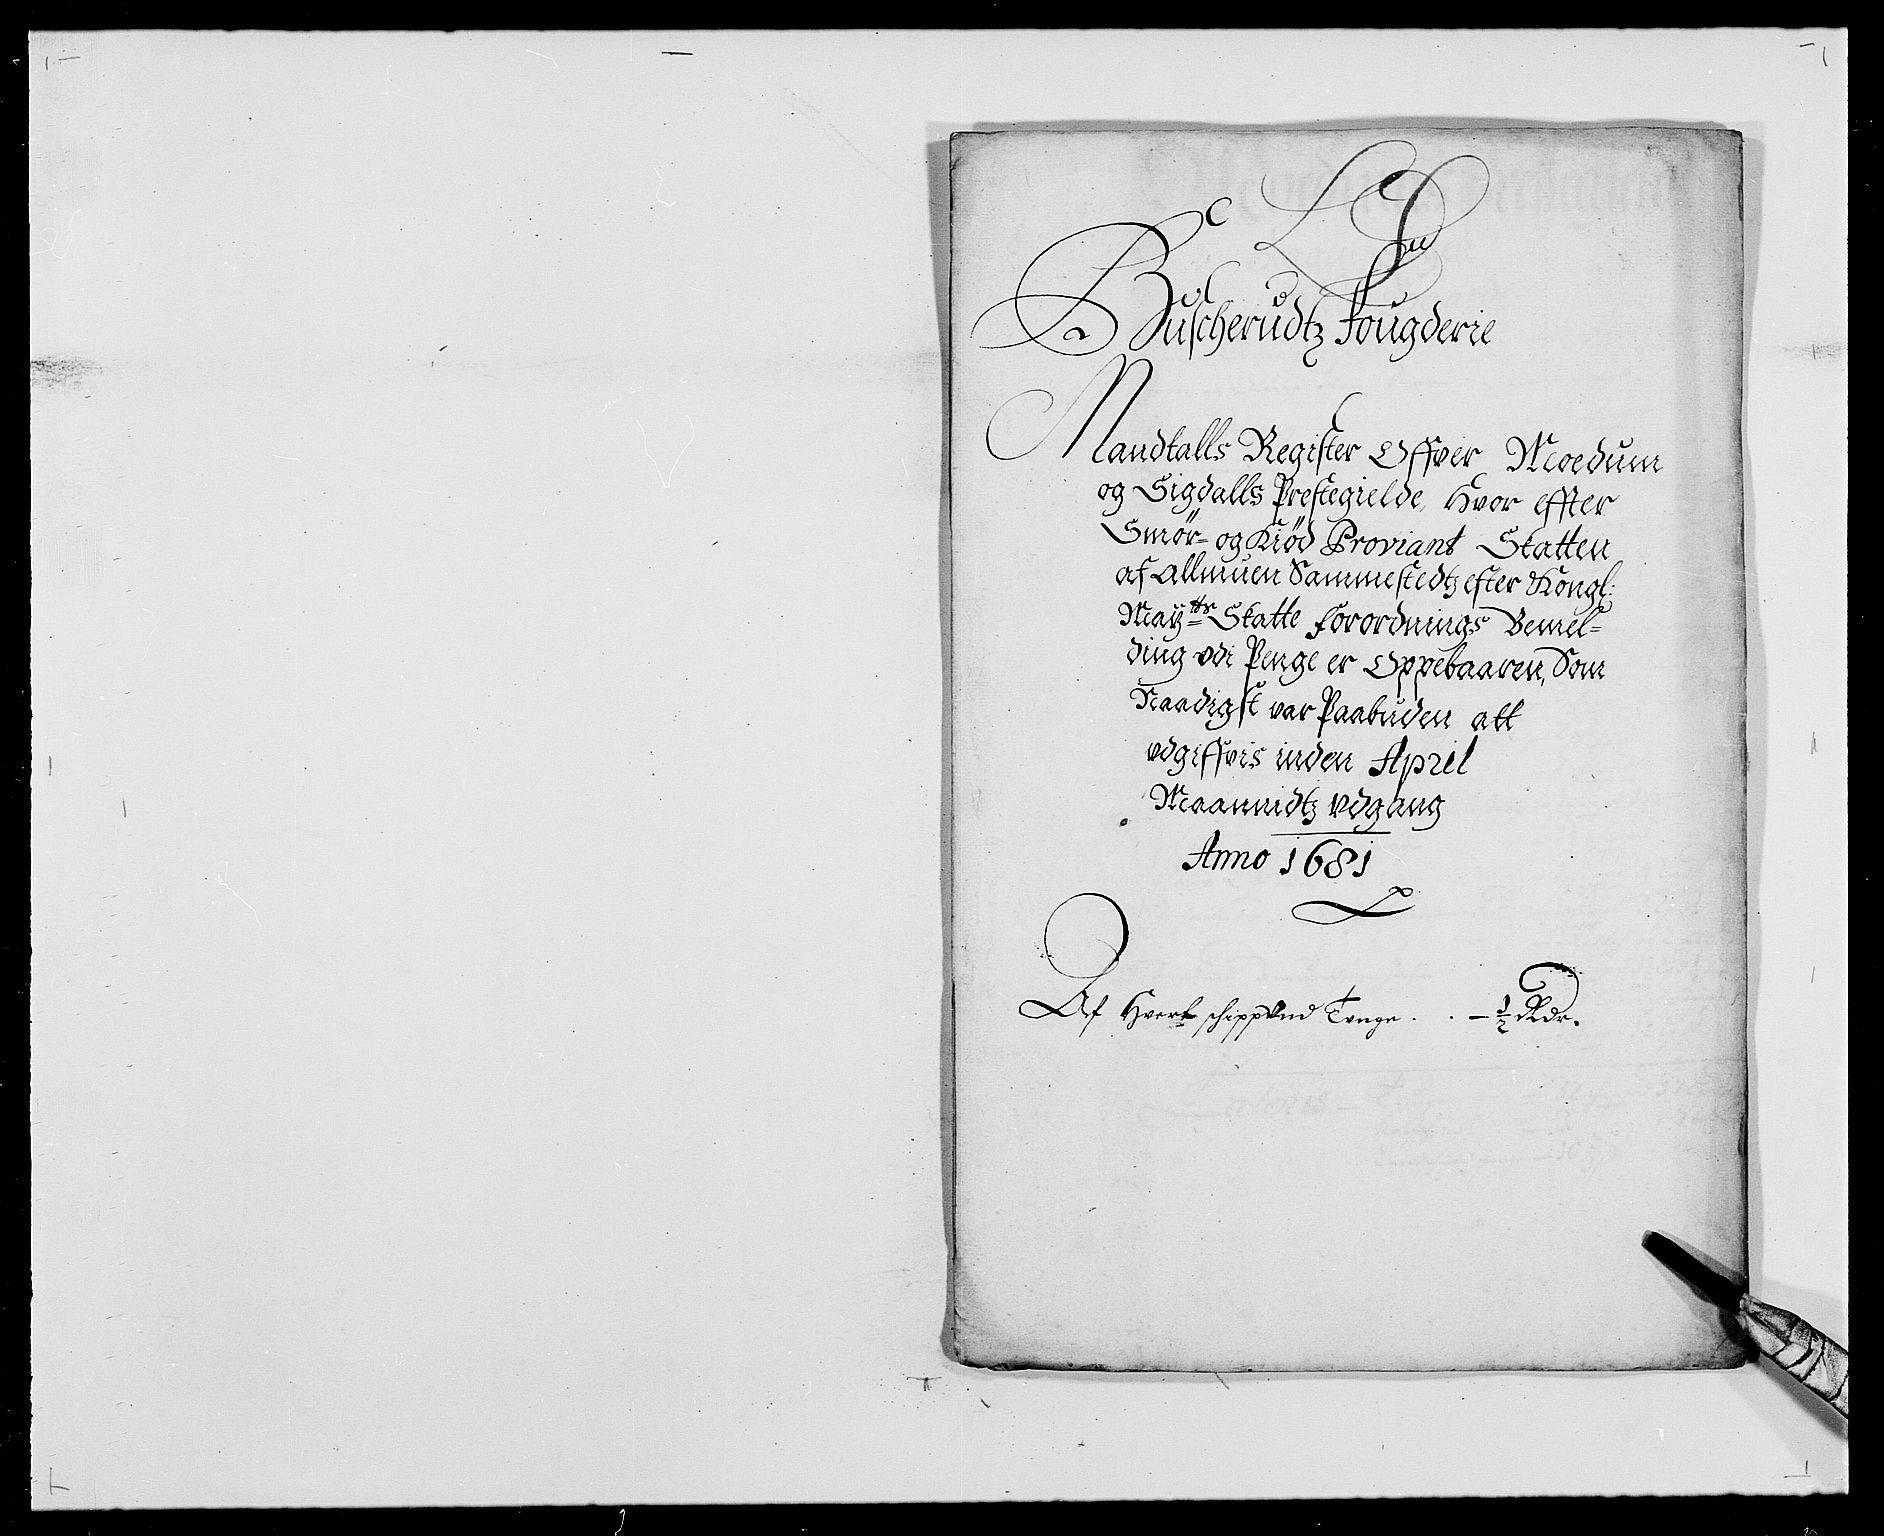 RA, Rentekammeret inntil 1814, Reviderte regnskaper, Fogderegnskap, R25/L1675: Fogderegnskap Buskerud, 1678-1681, s. 293